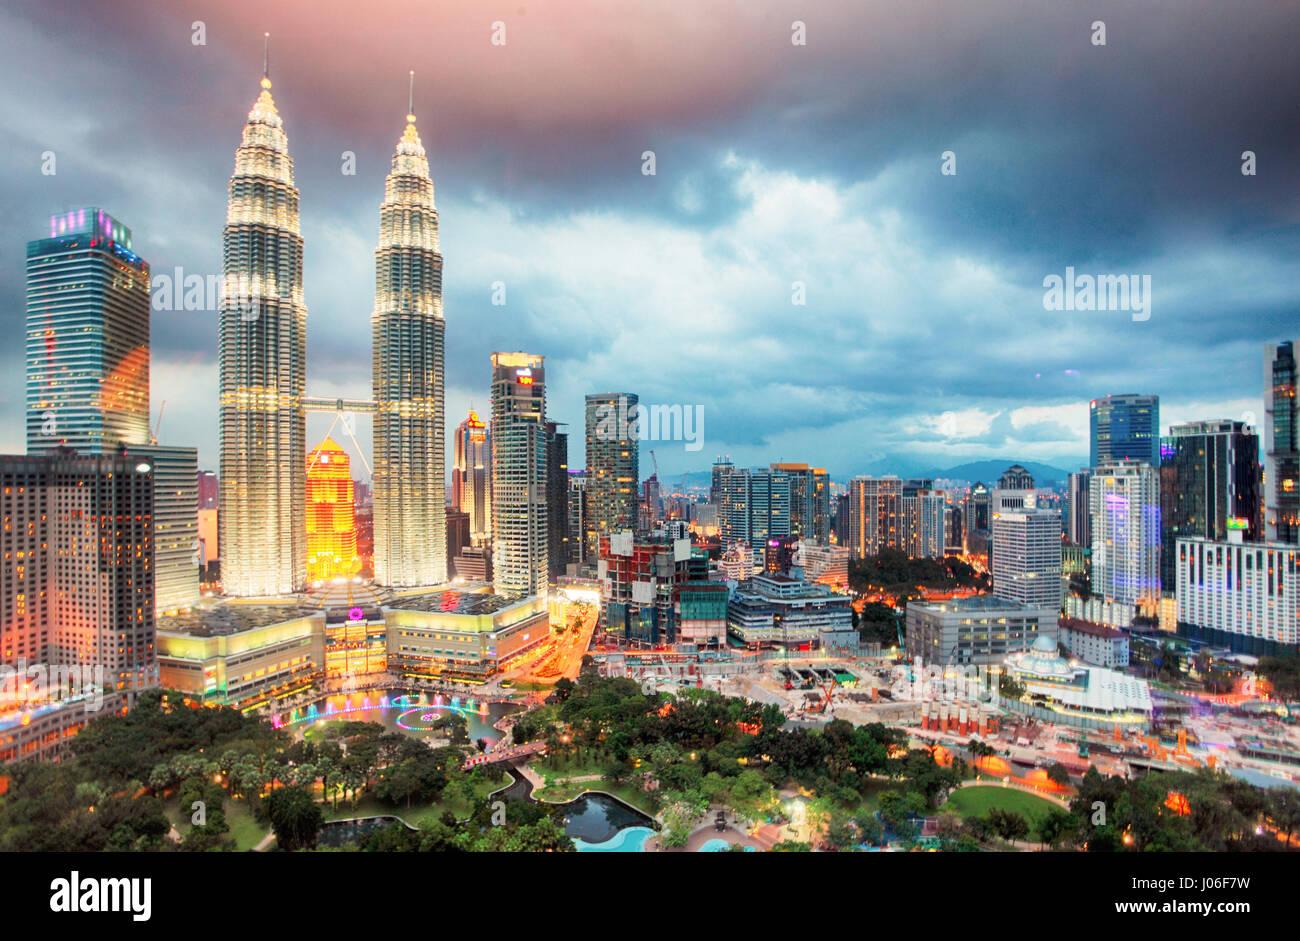 Kuala Lampur skyline al crepuscolo, Malaysia Immagini Stock